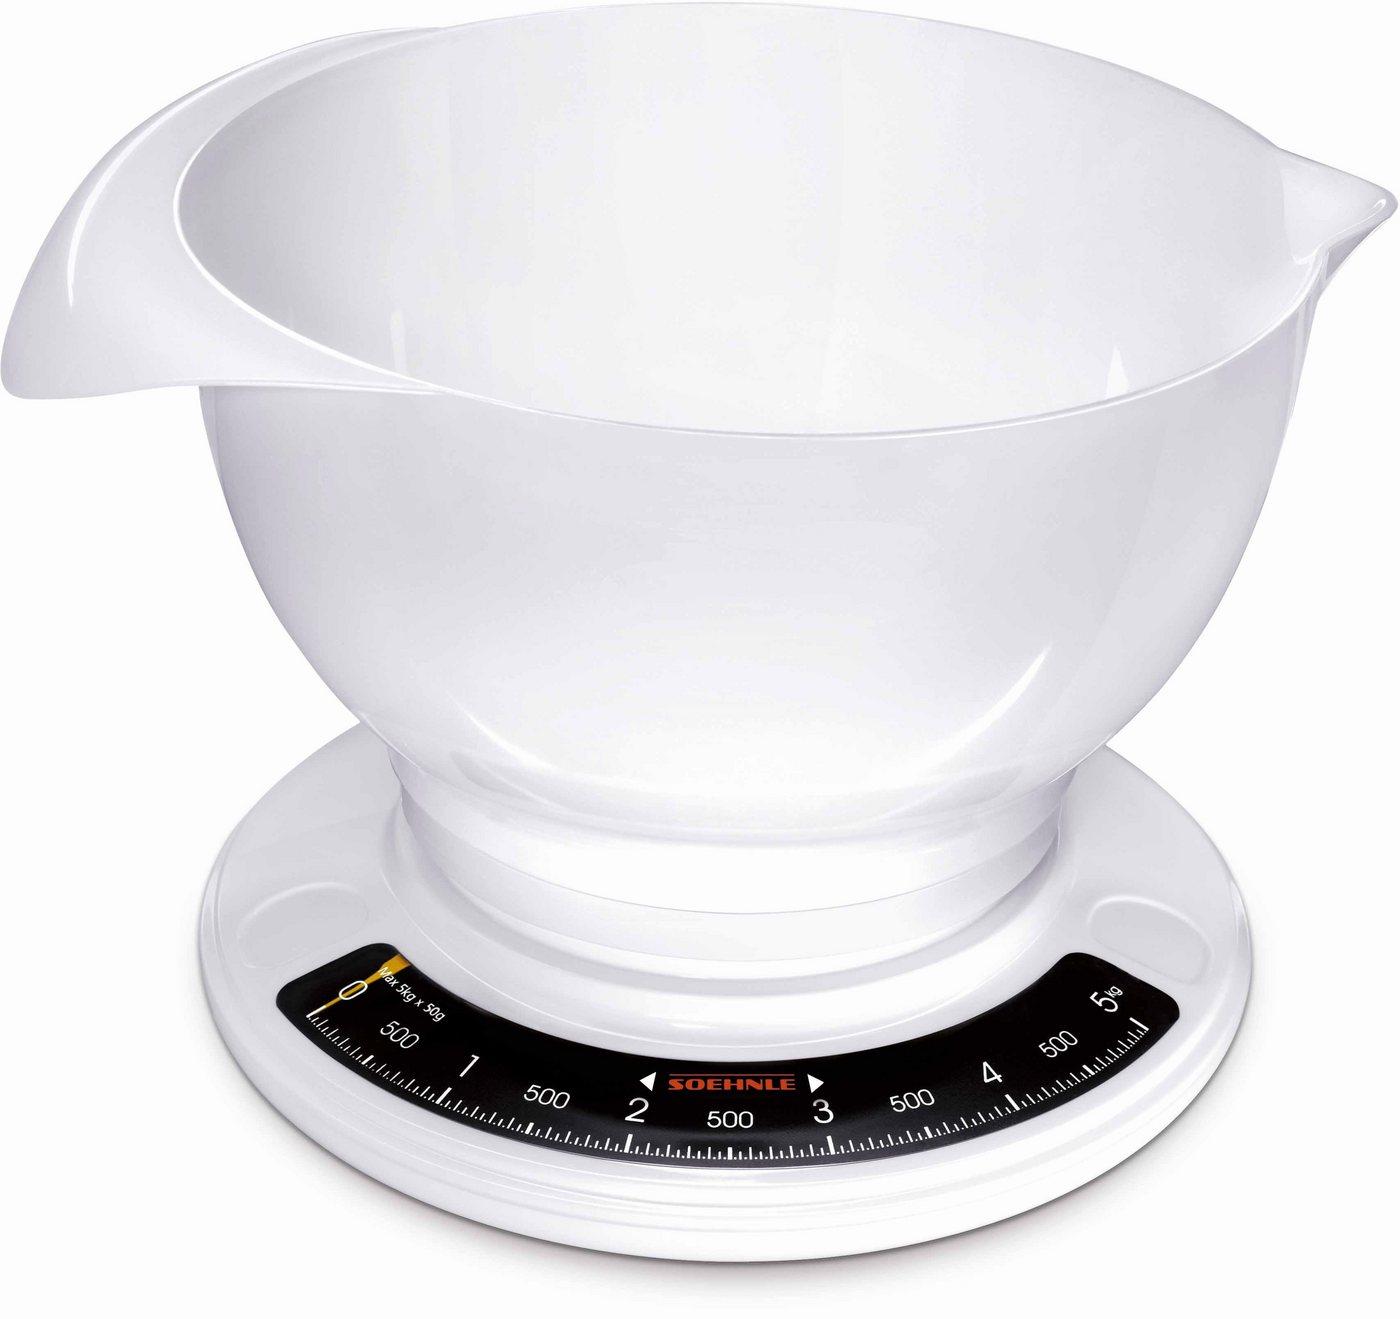 Soehnle Analoge Küchenwaage, mit großer Rührschüssel, »Culina Pro«